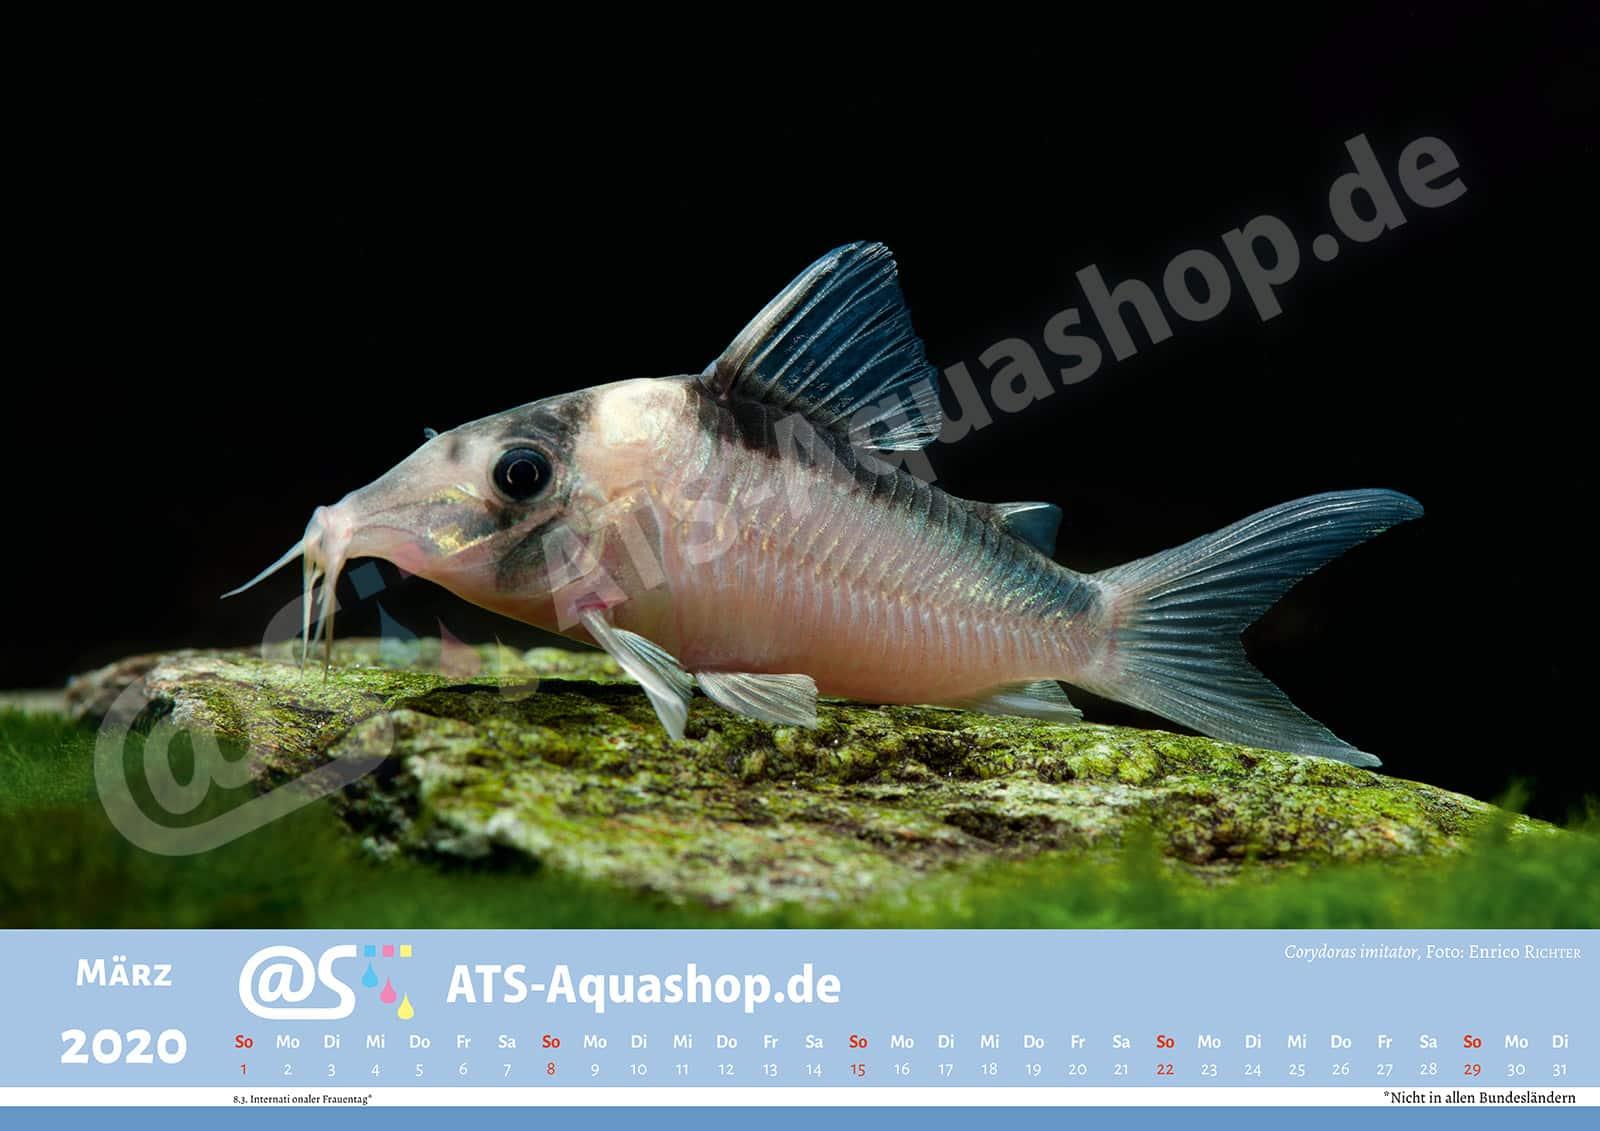 Foto Jahreskalender 2020 DIN A3: Corydoras imitator